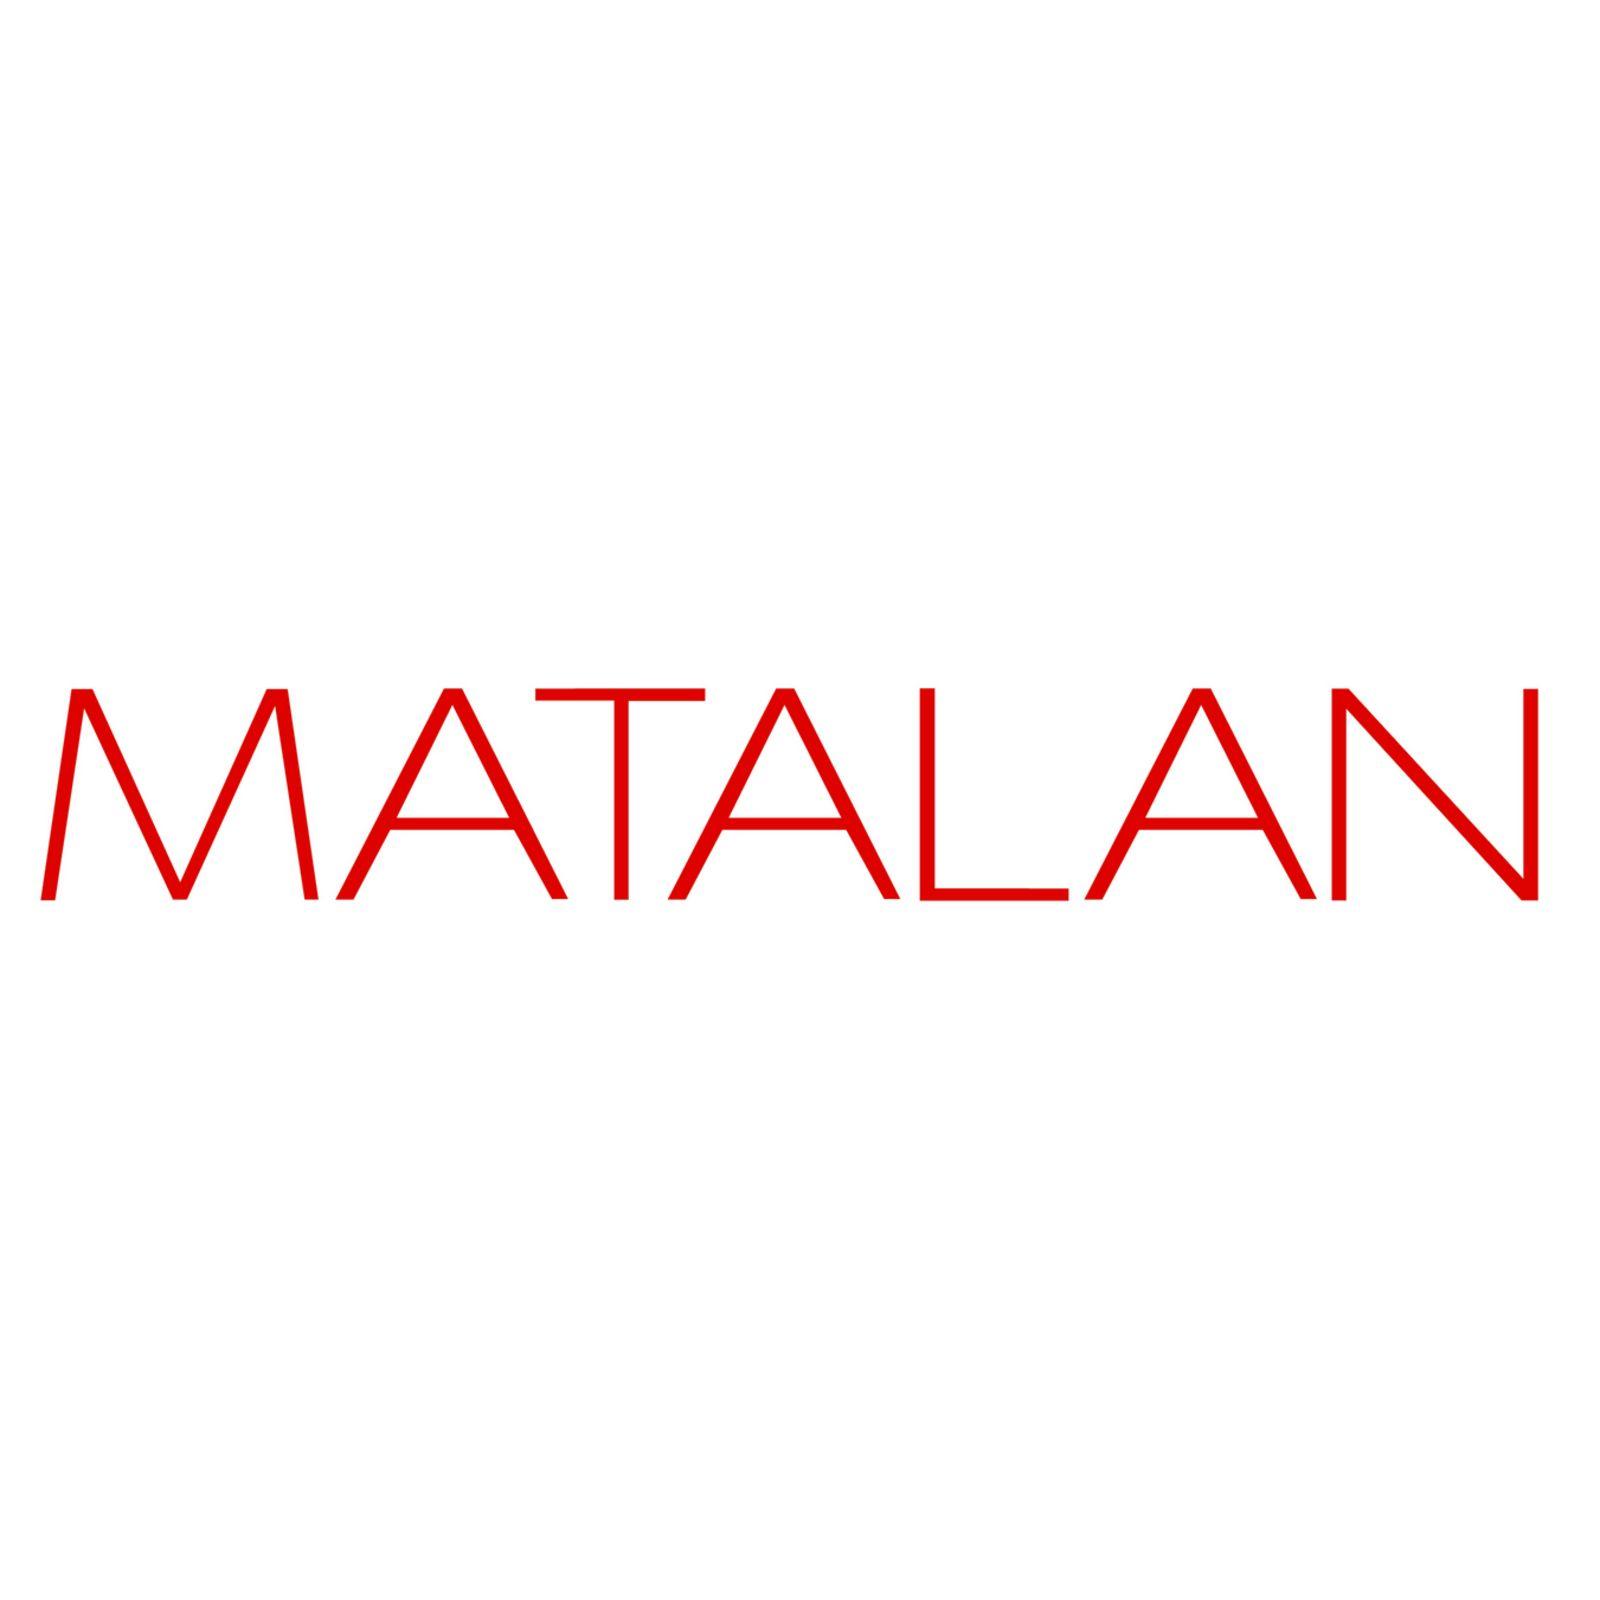 MATALAN (Image 1)